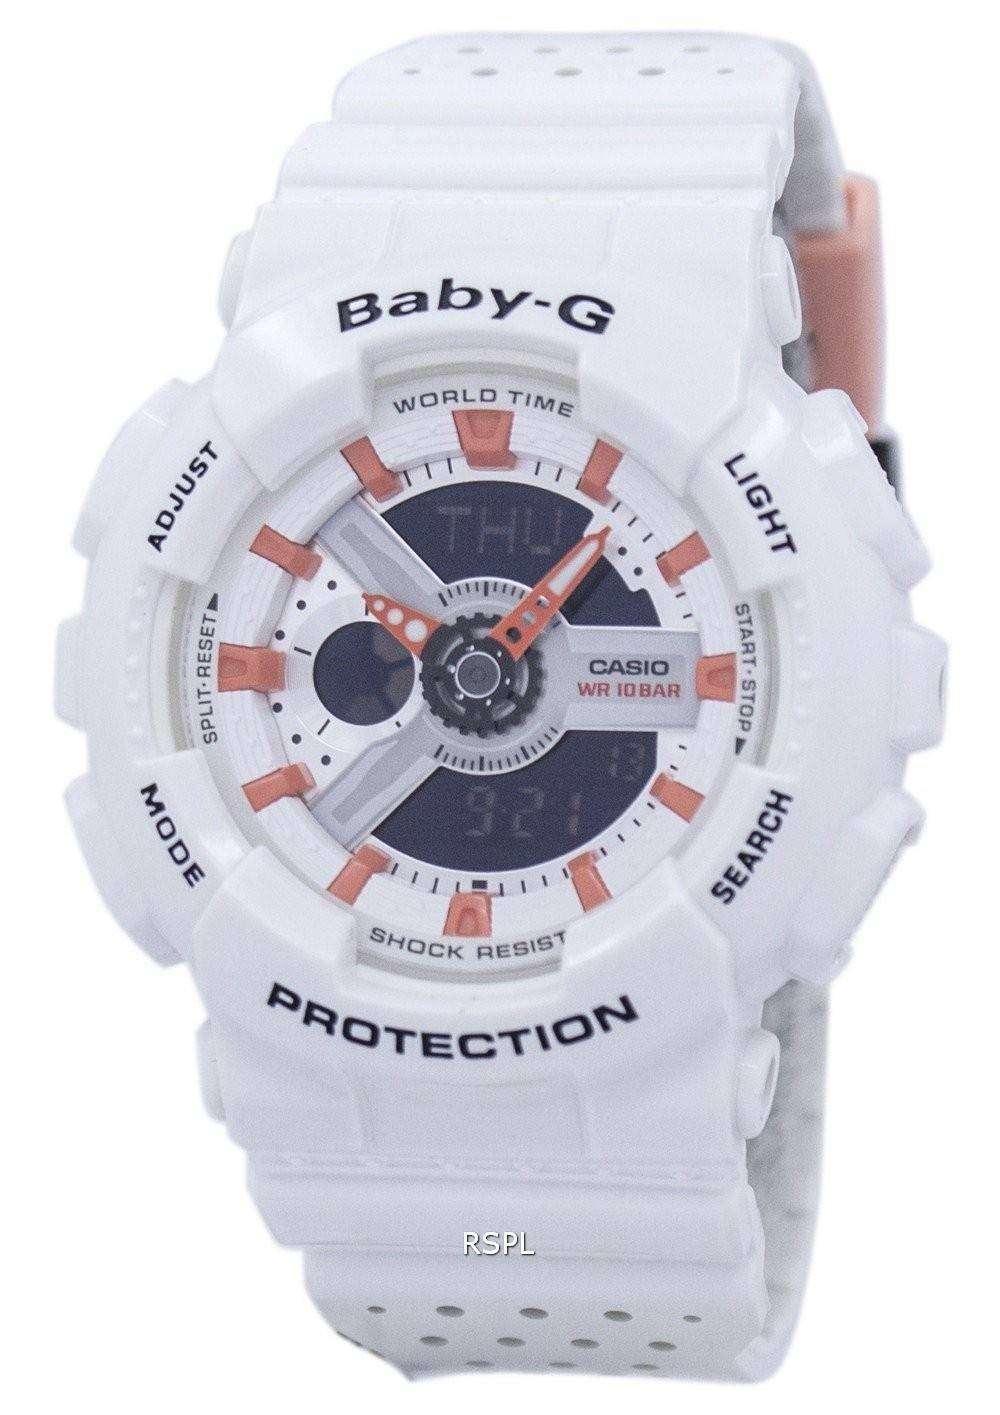 Casio Baby-G Shock Resistant World Time Analog Digital BA-110PP-7A2 Women s 42fd7d4c33